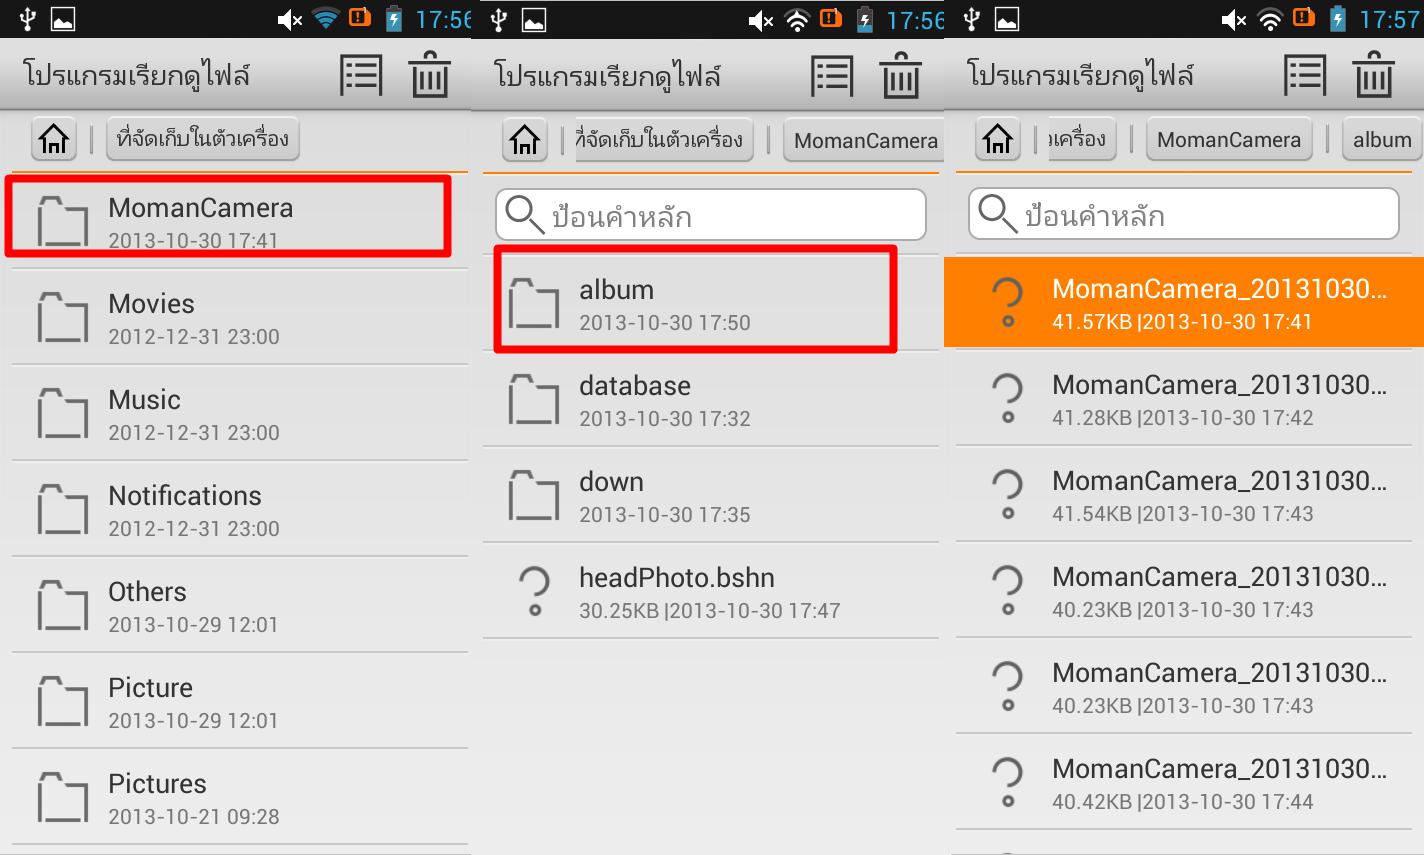 Screenshot_2013-10-30-17-56-44